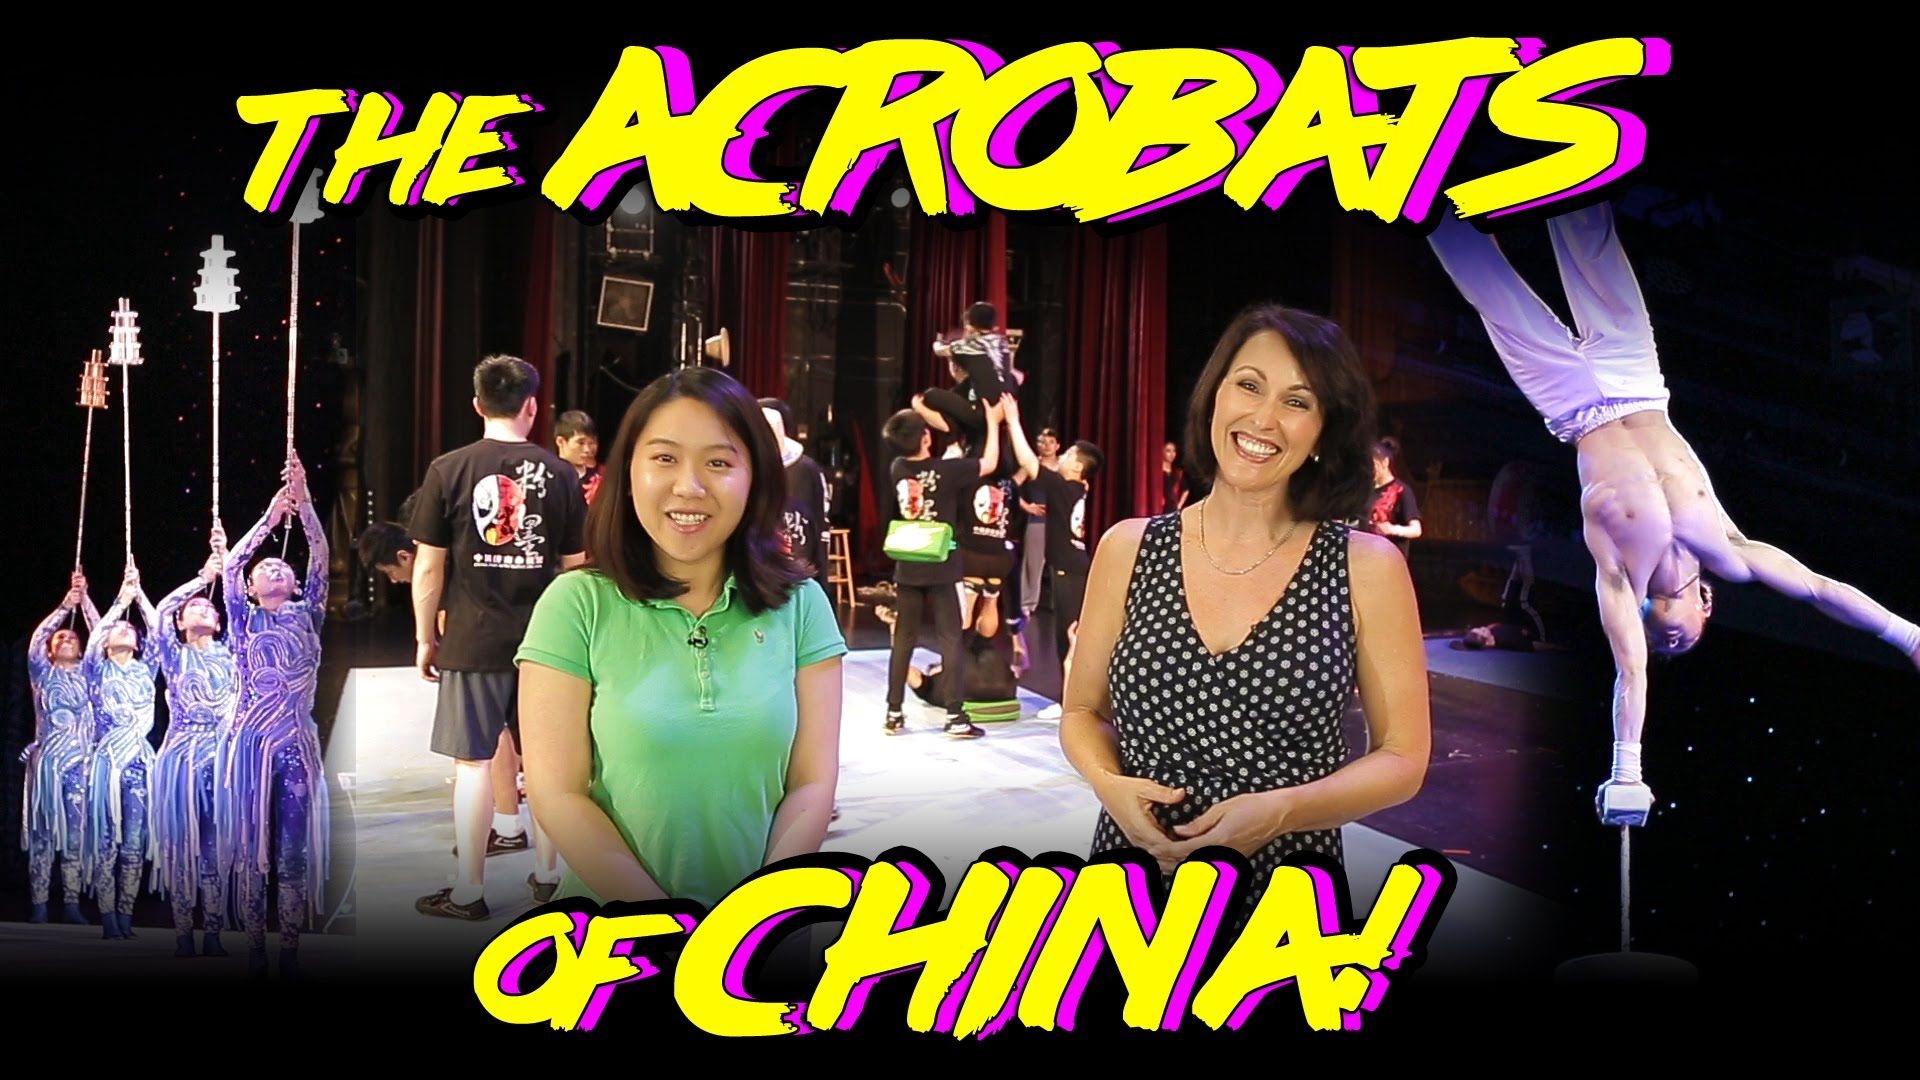 The Acrobats of China Featuring New Shanghai Circus - Branson Missouri